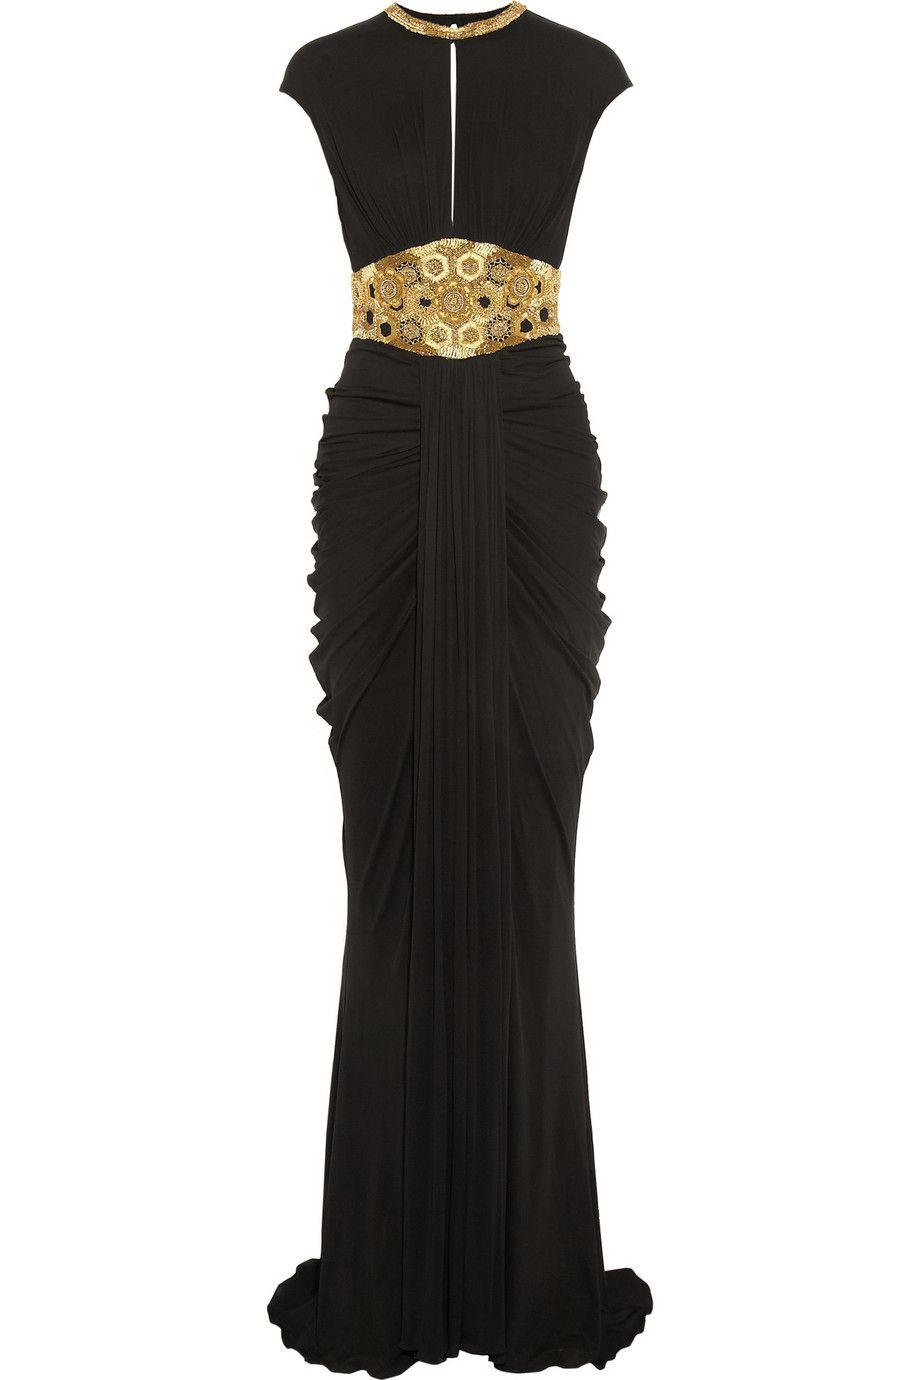 45fce94d Alexander Mcqueen Embellished Stretch-Jersey vestido de Negro   Lyst